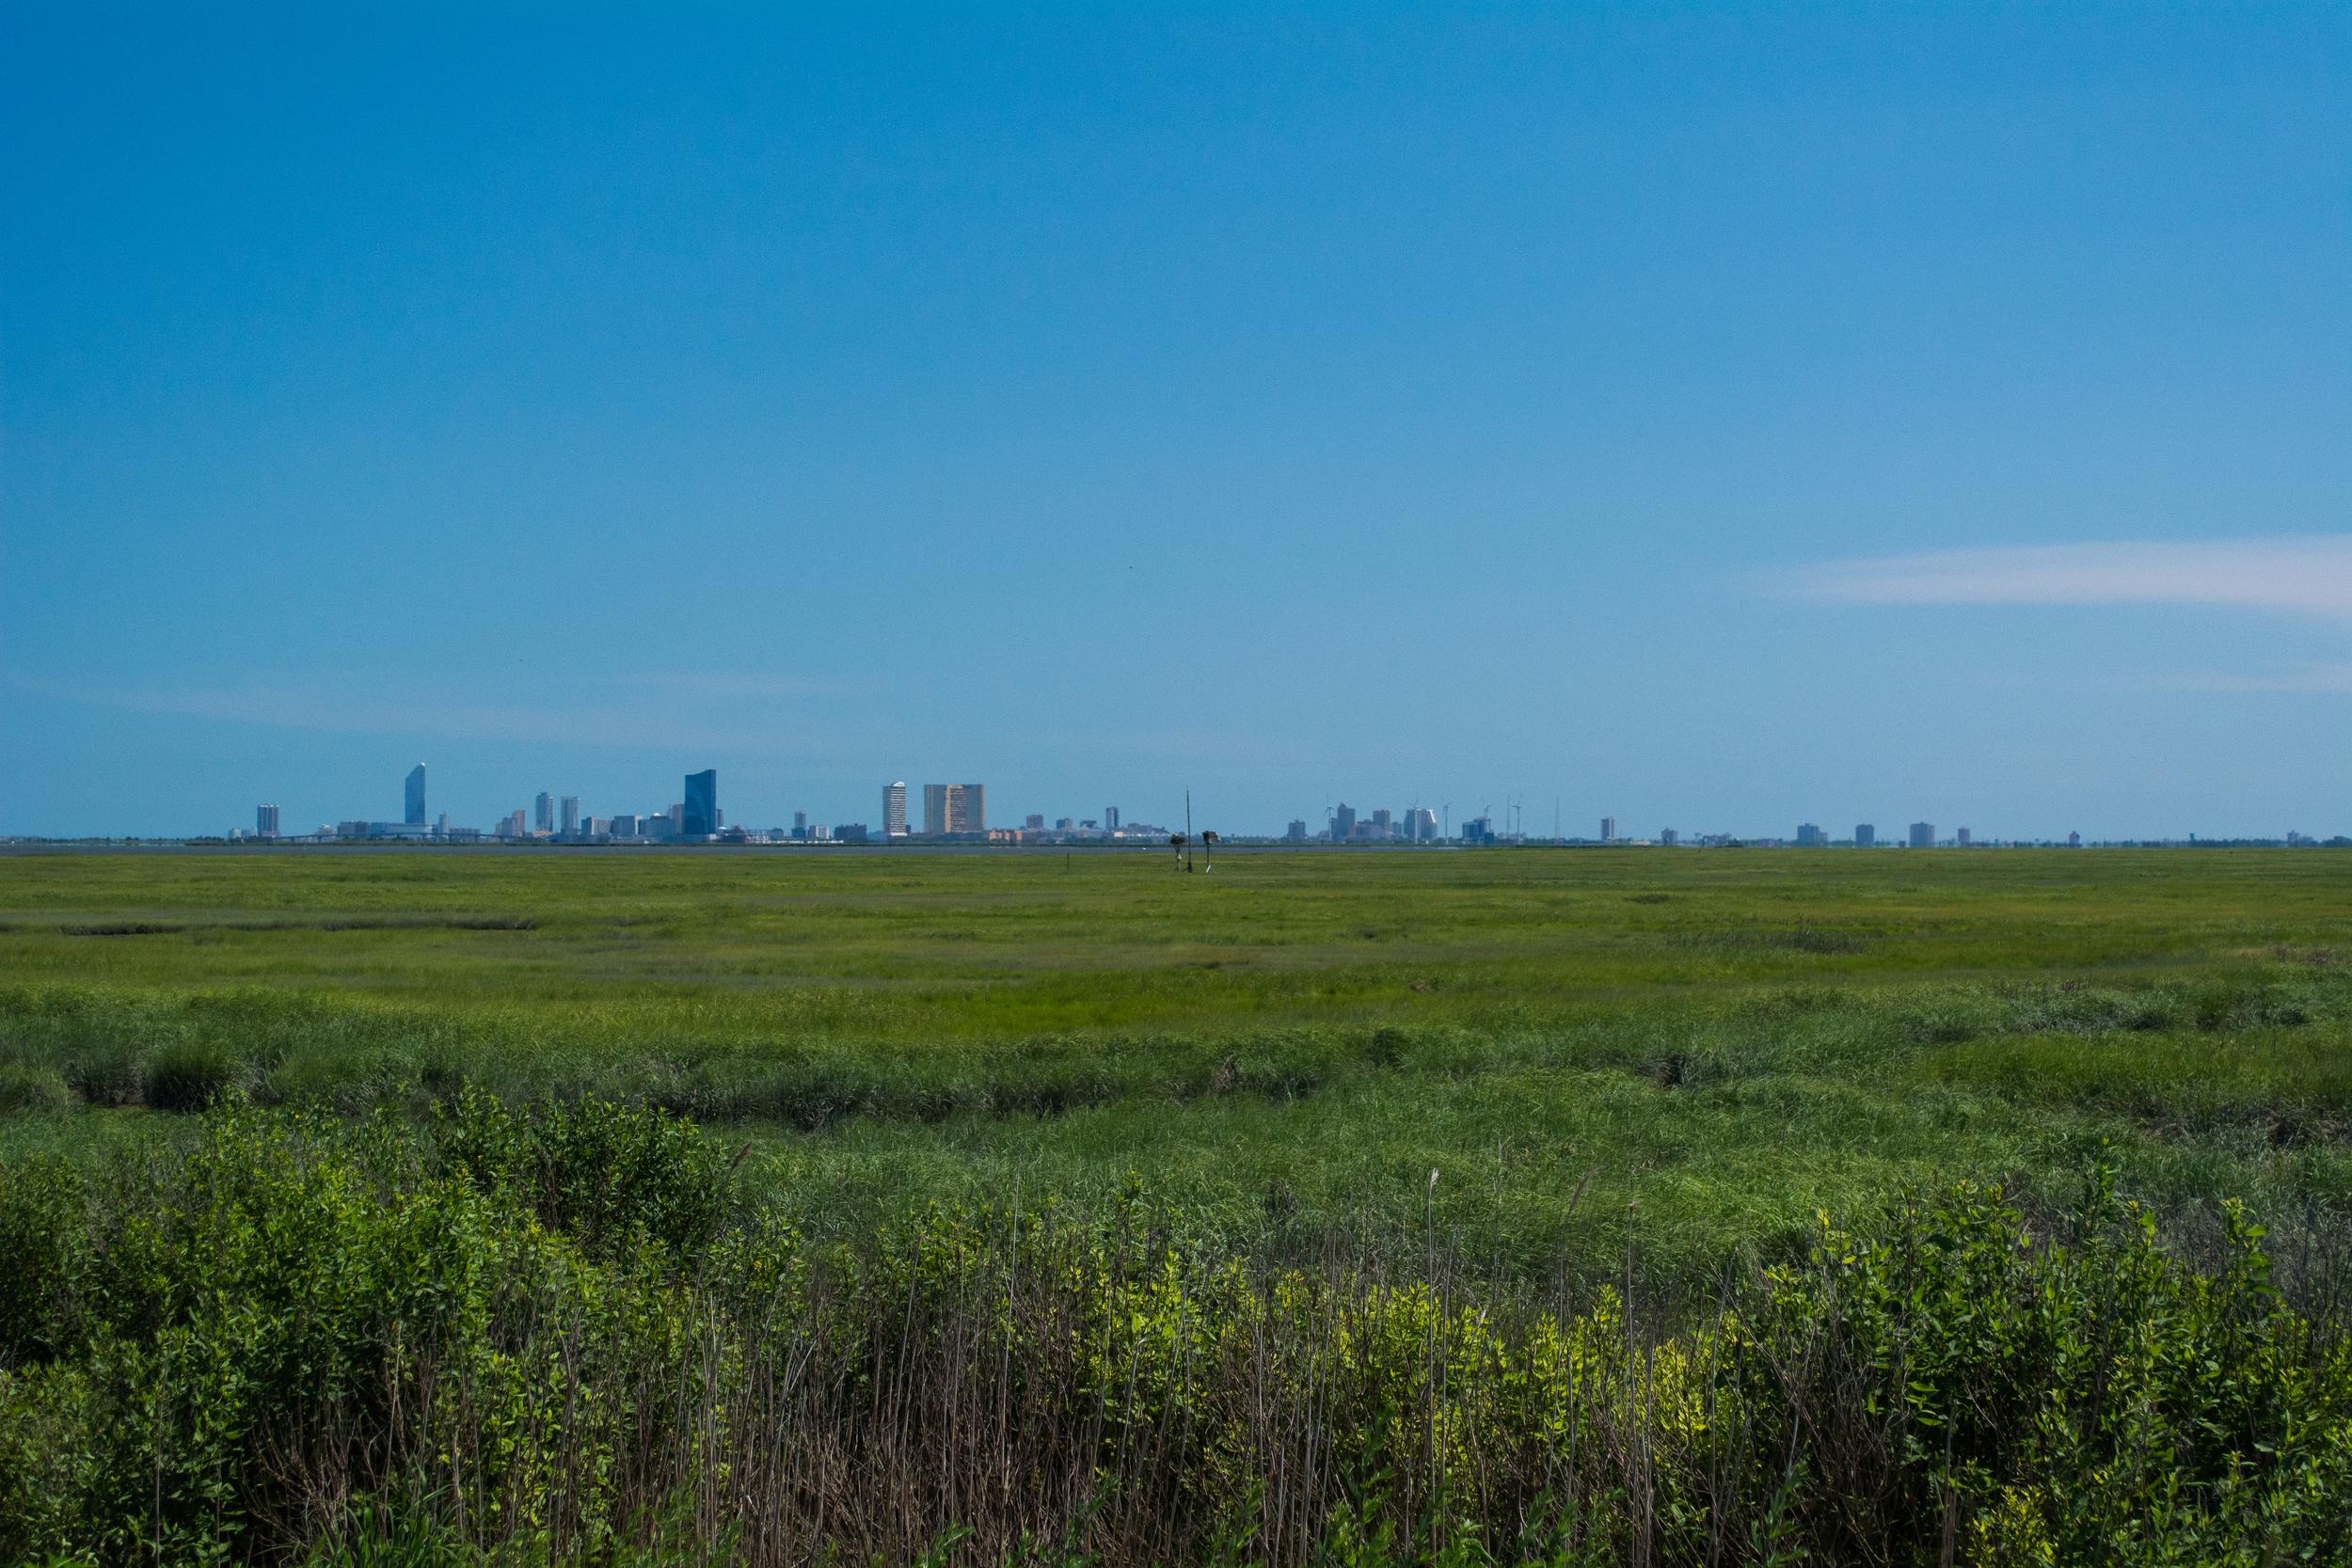 Atlantic City, NJ not to far from the refuge.